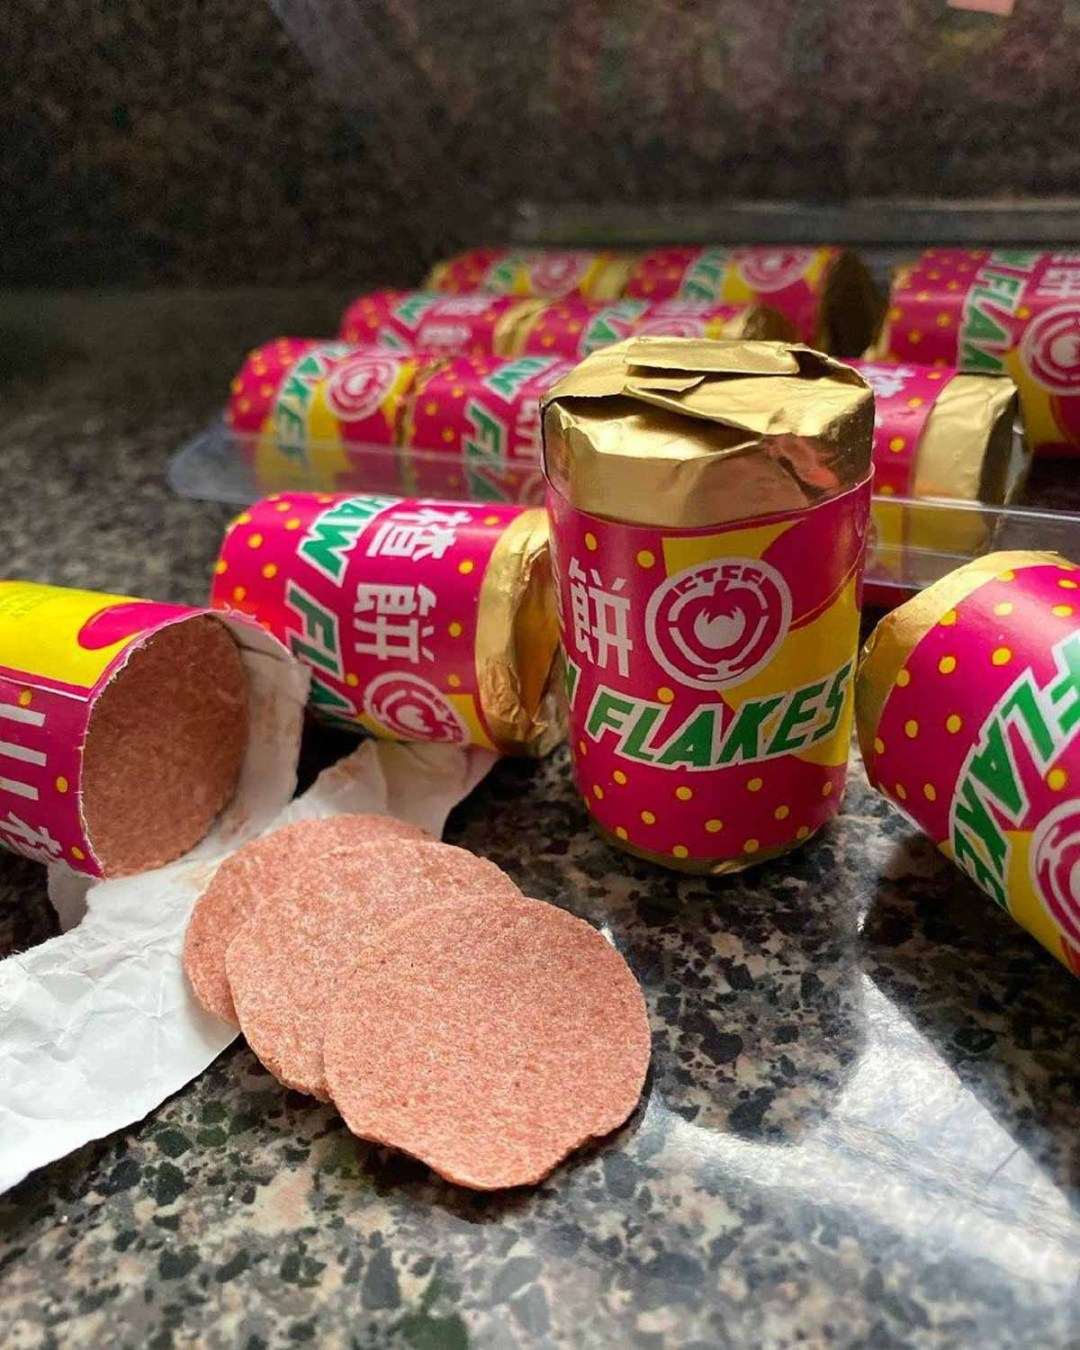 Primary School Snacks - Haw Flakes